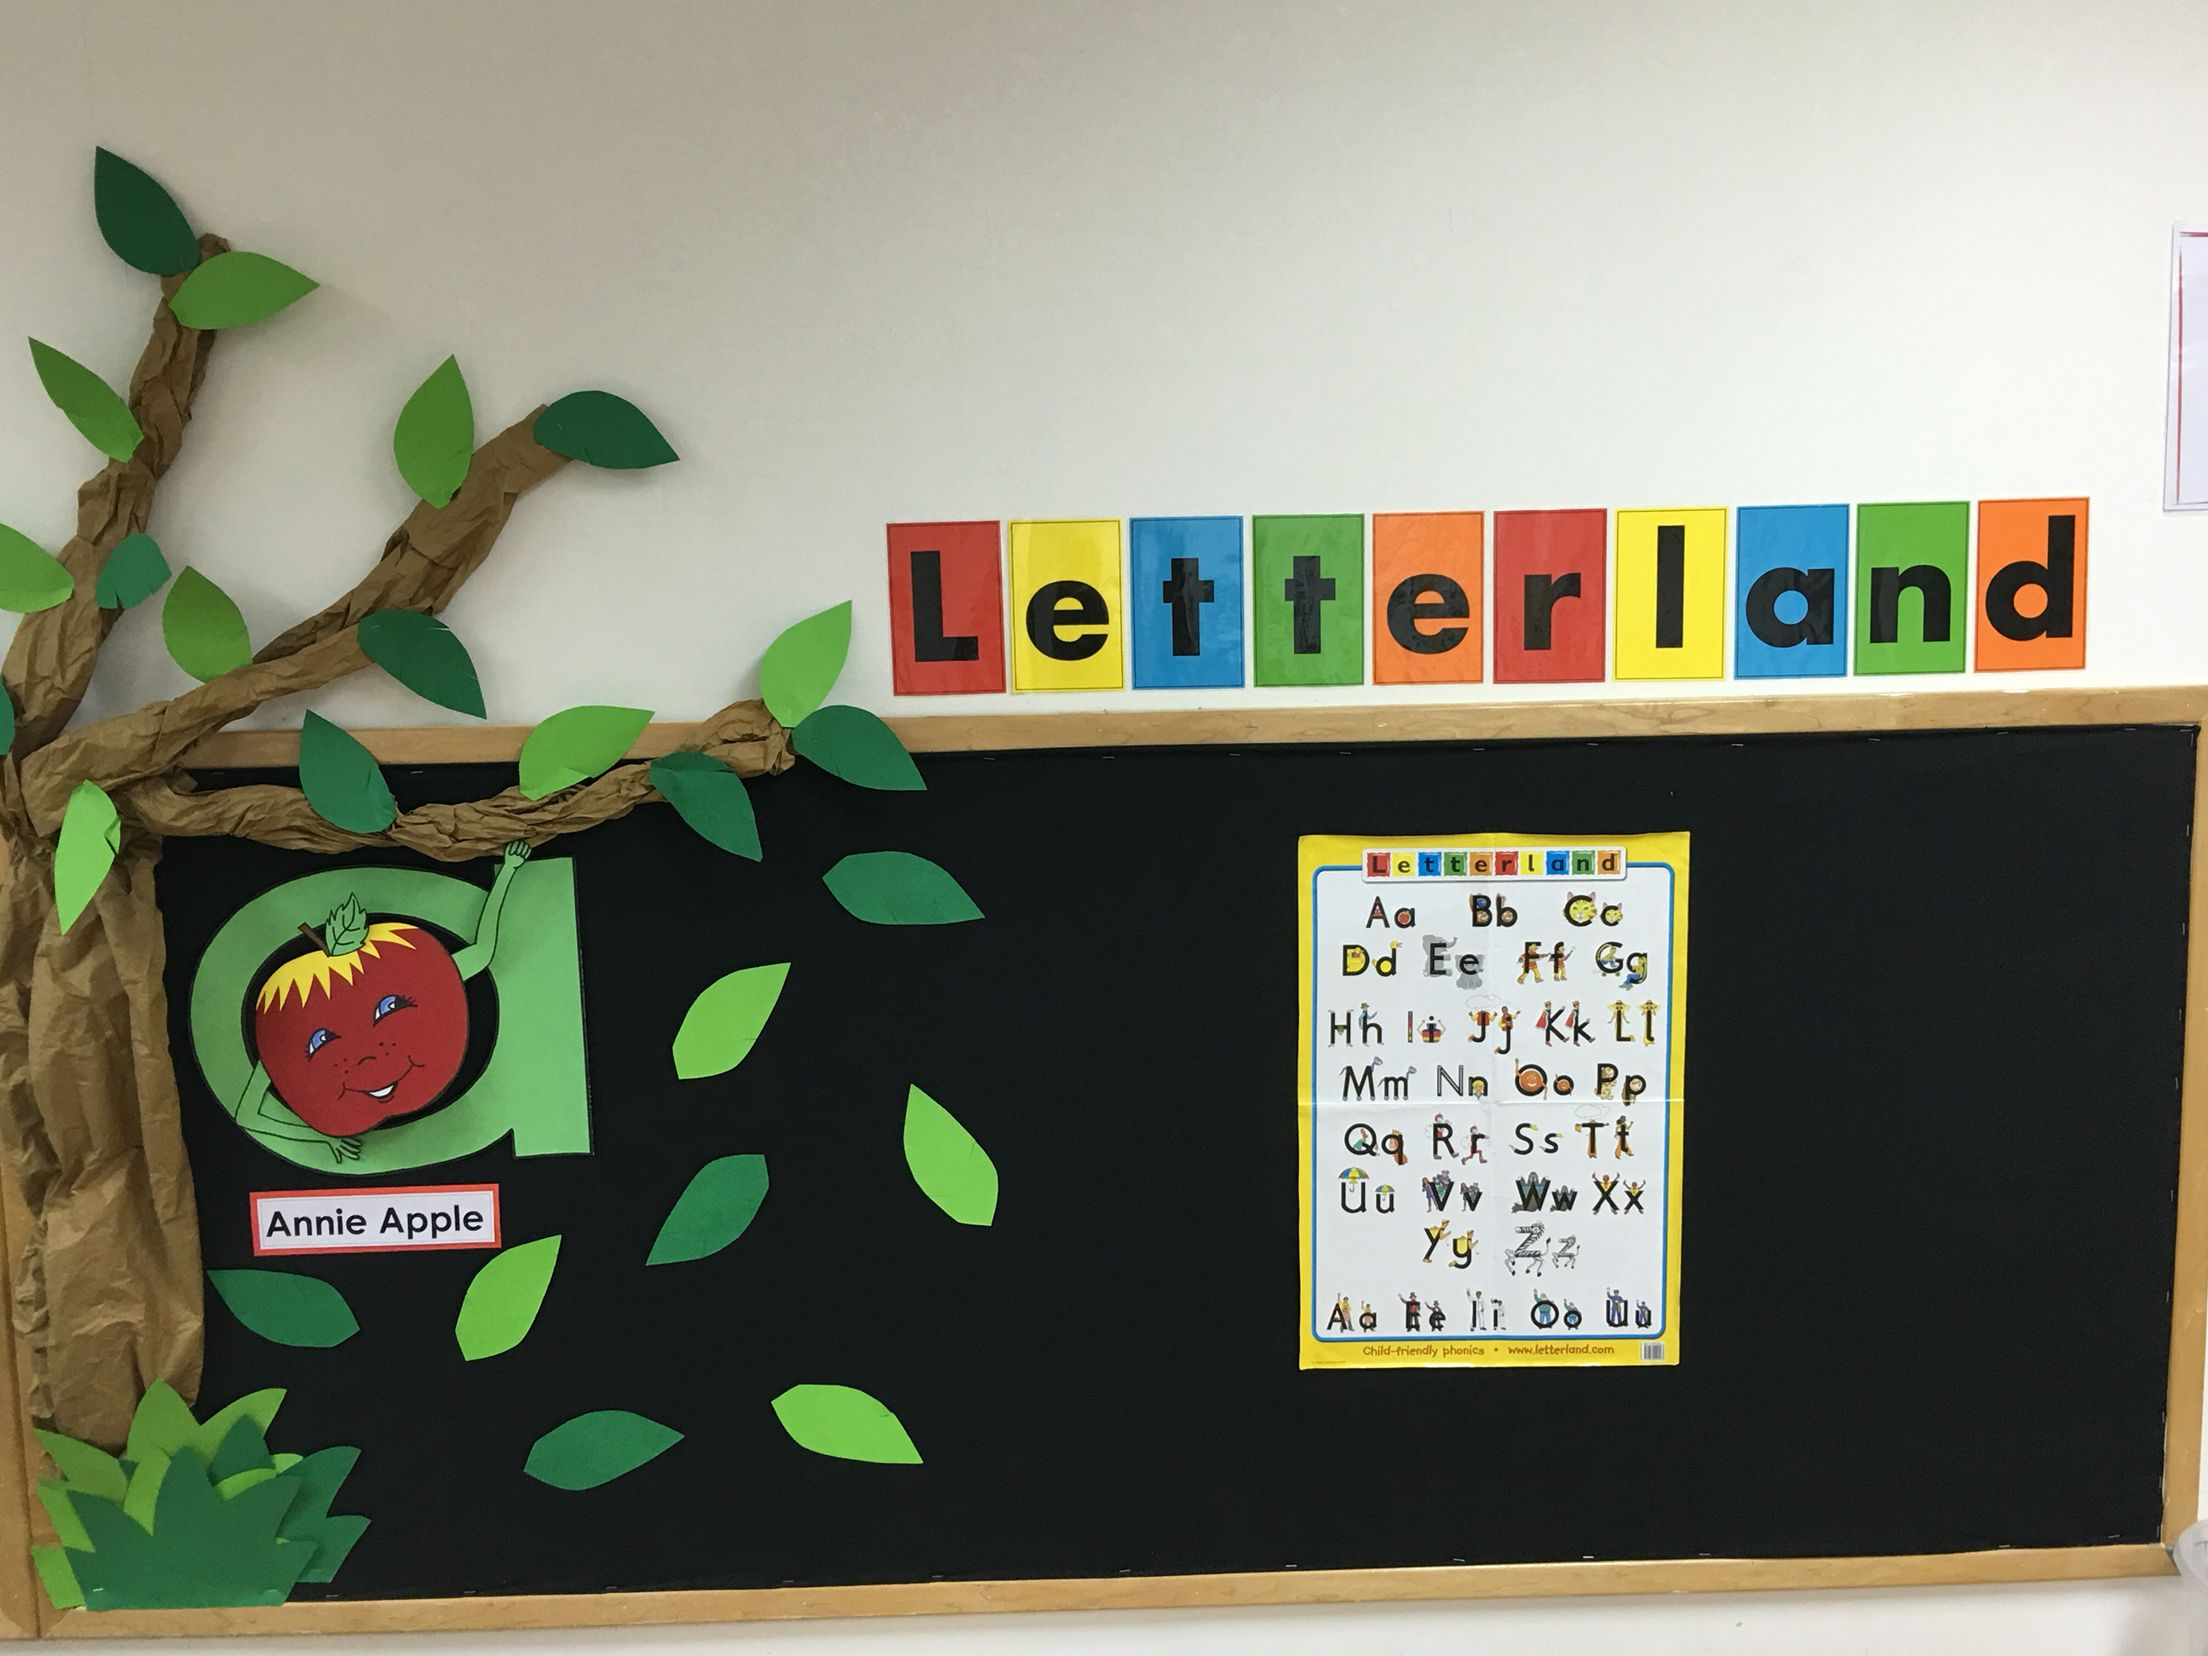 Letterland Board Annie Apple Kindergarten Letters Classroom Themes Classroom Decorations [ 1656 x 2208 Pixel ]